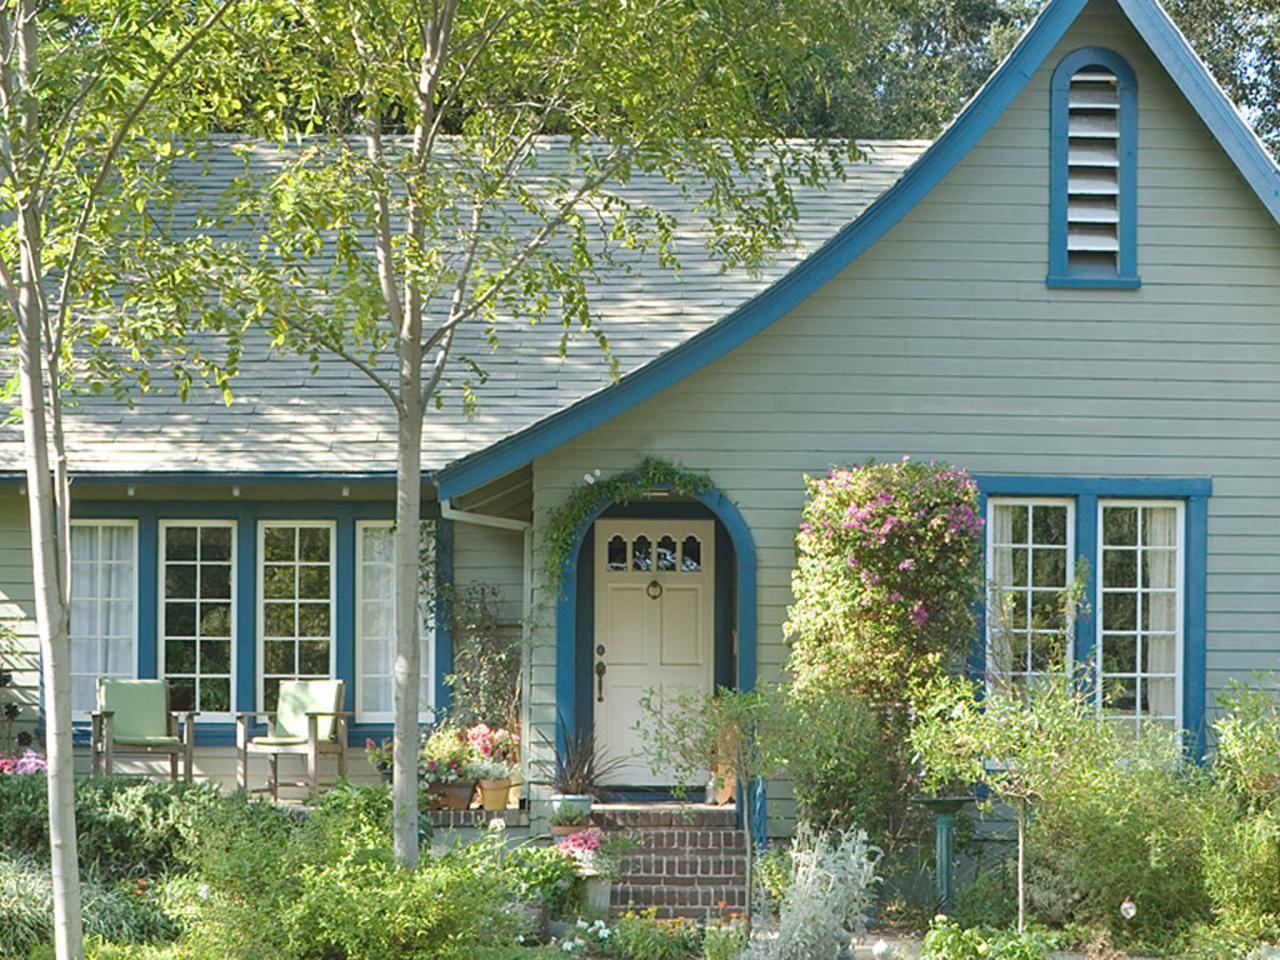 Exterior home accents - 20 Inviting Home Exterior Color Ideas Outdoor Design Landscaping Ideas Porches Decks